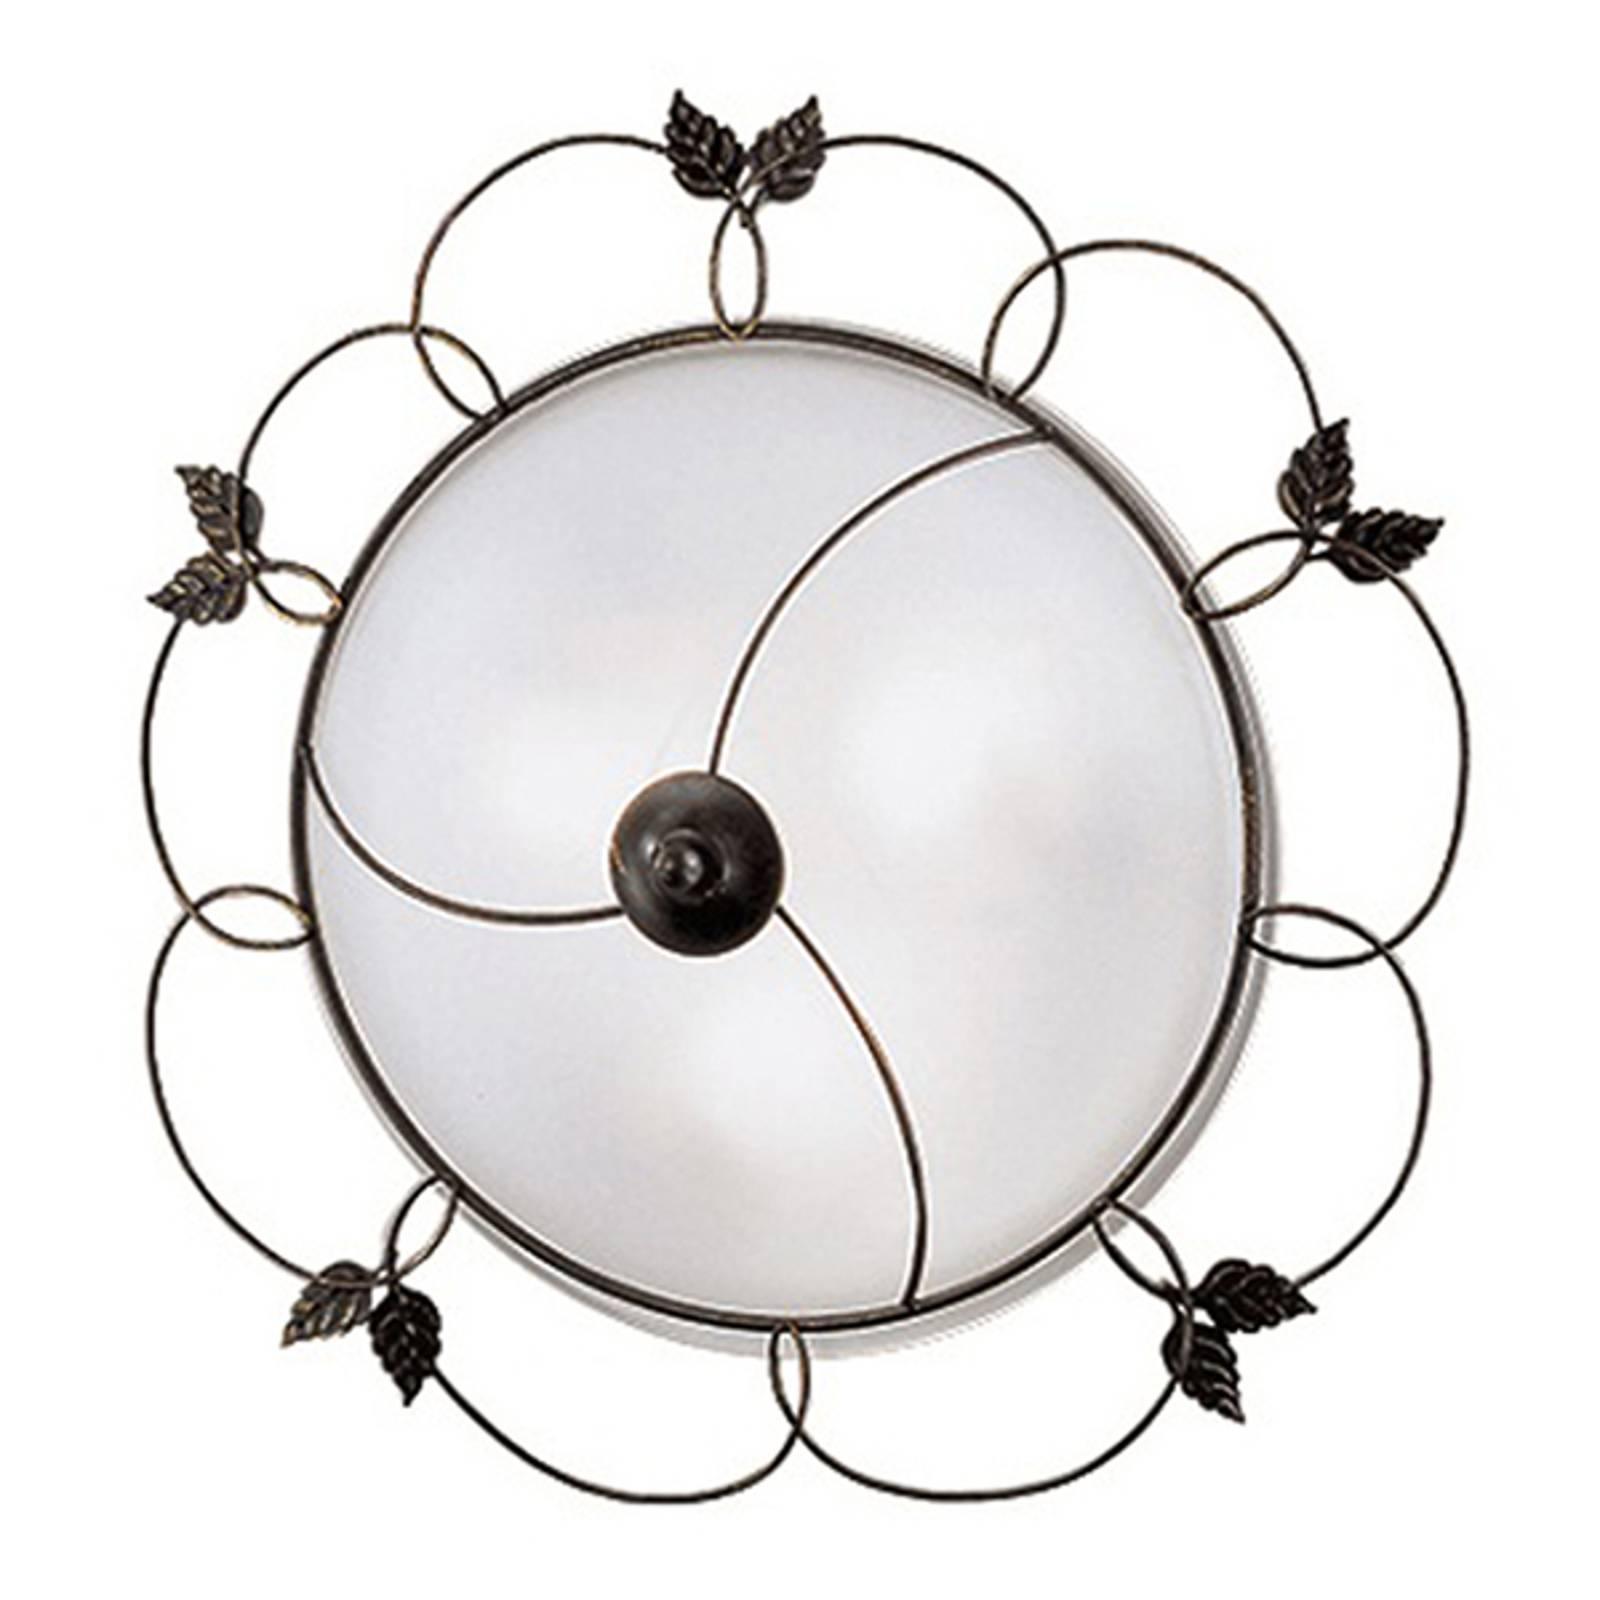 Plafondlamp FLORA by Kögl, 58 cm